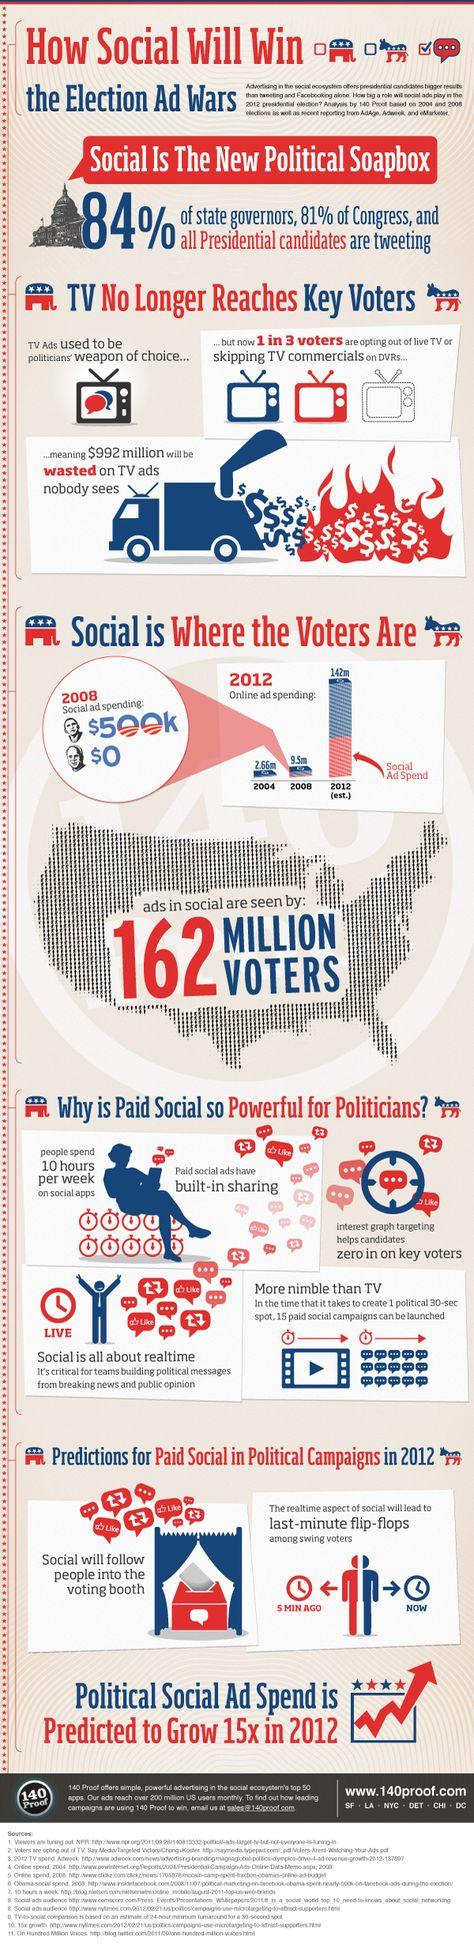 Social Media in Politics (Infographic)